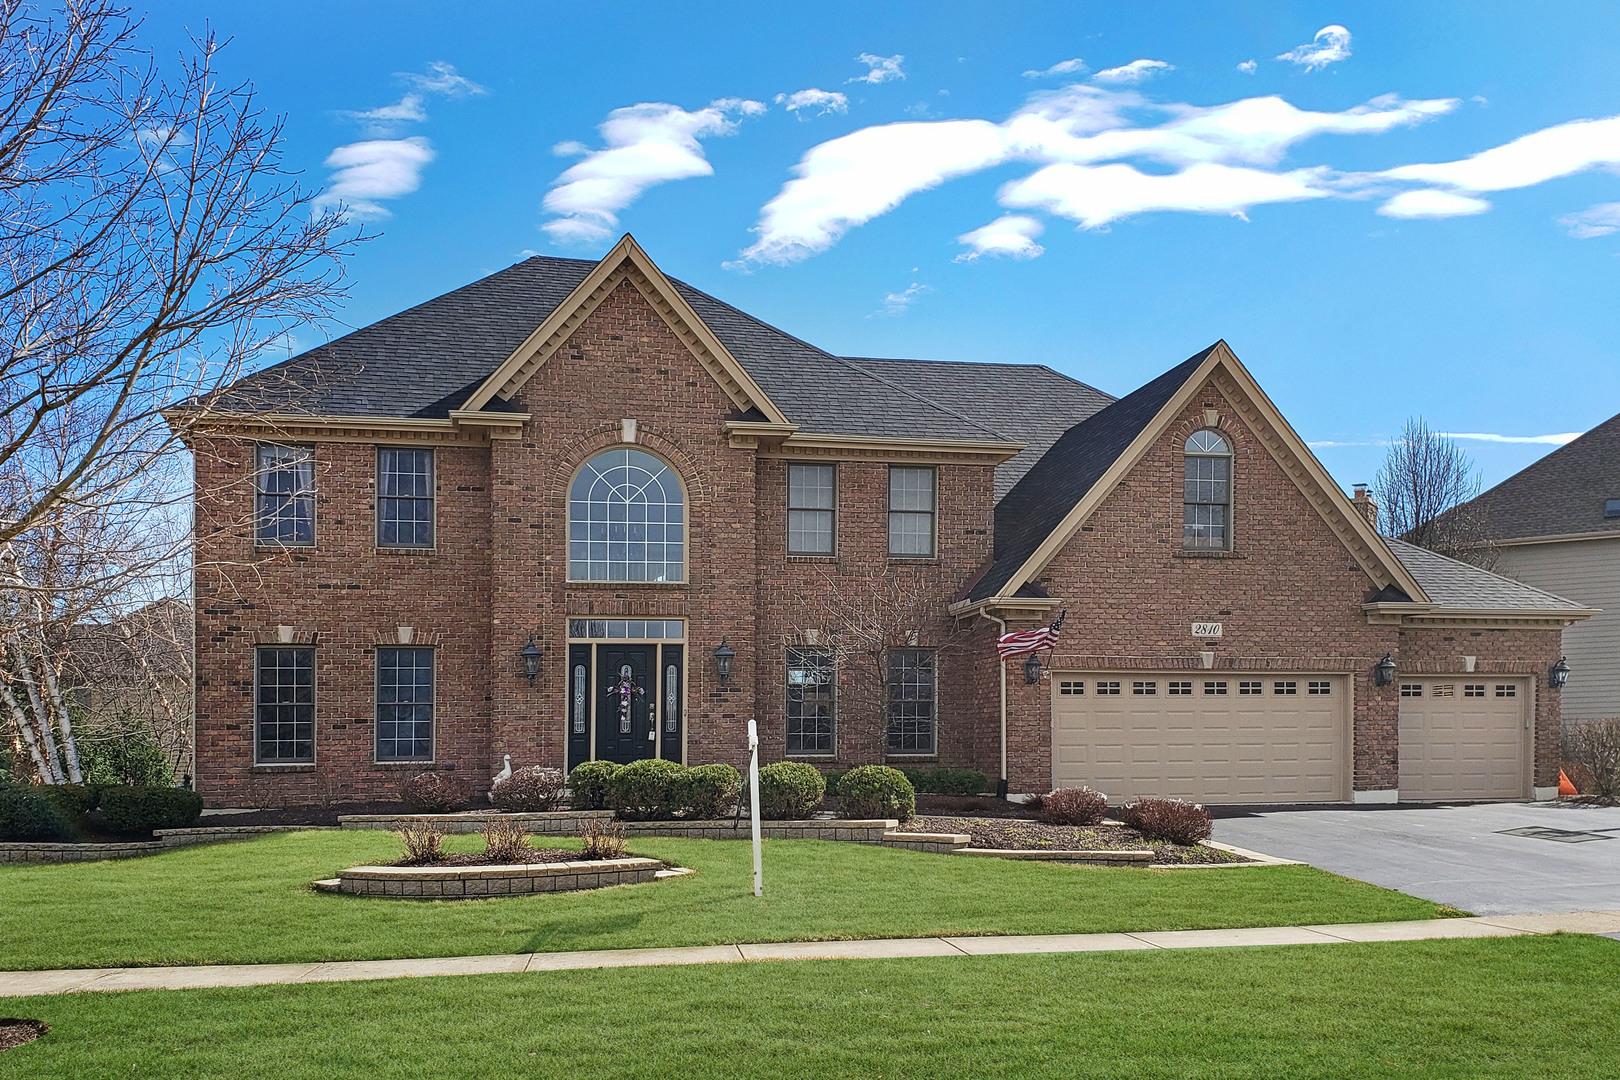 2810 Weaver Lane, Batavia, Illinois 60510